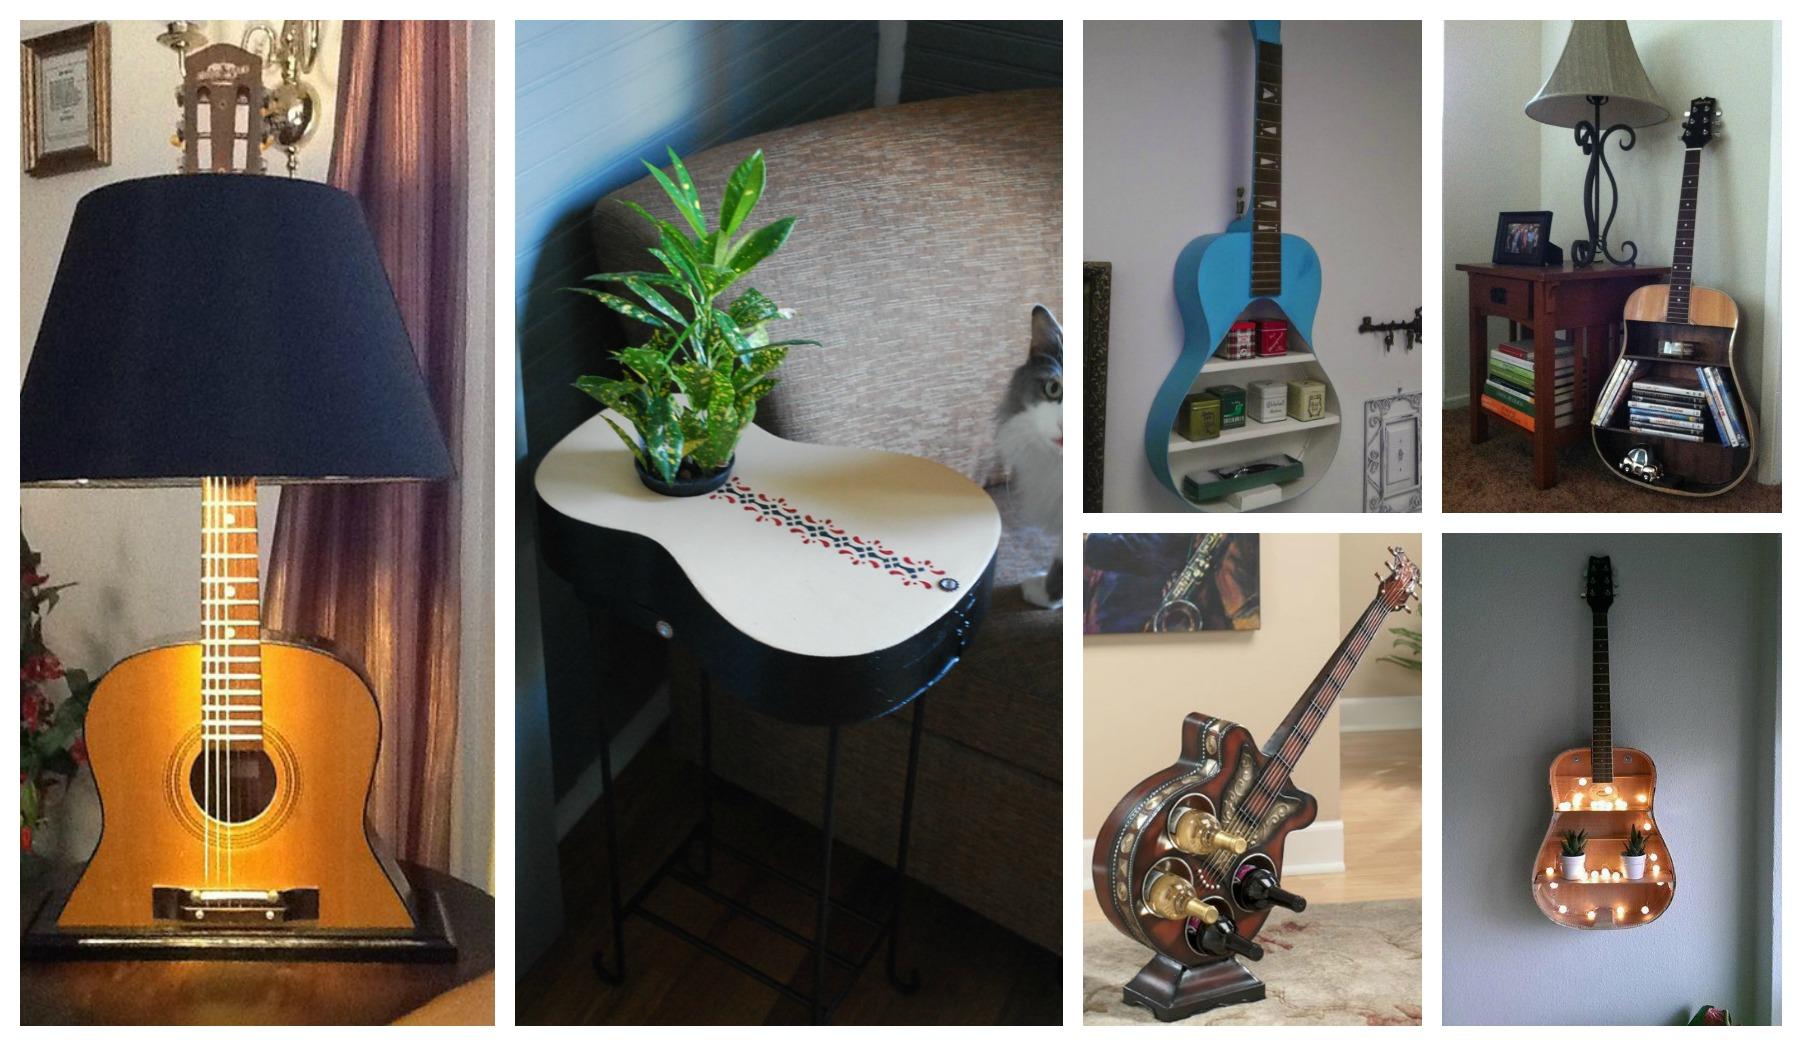 How To Repurpose Guitars In Home Decor